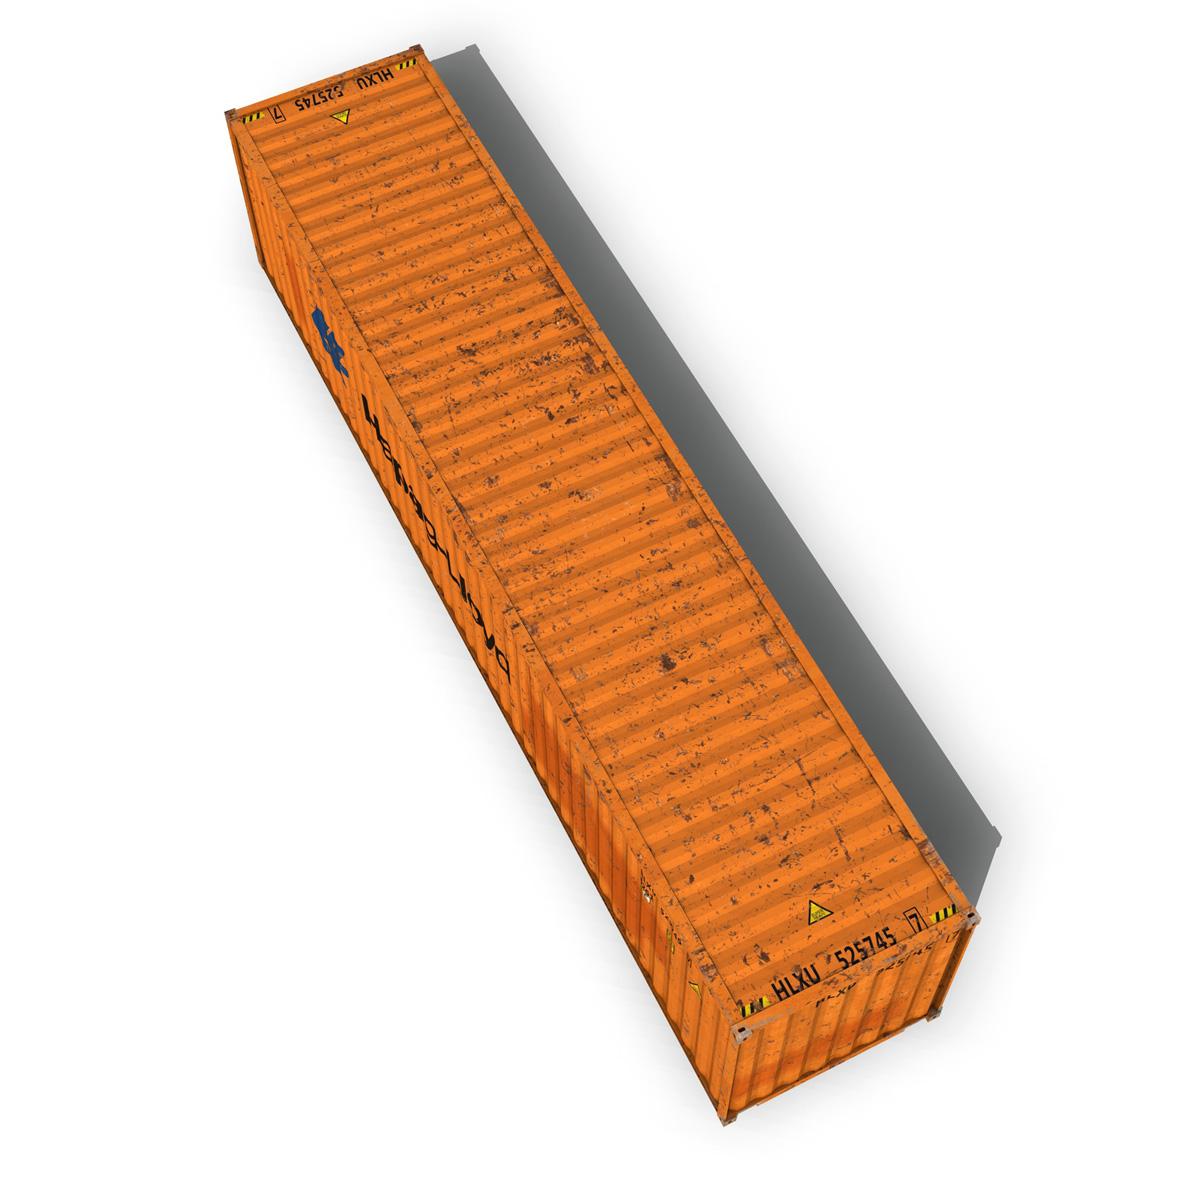 40ft тээврийн чингэлэг - hapag lloyd 3d загвар 3ds fbx lwo lws obj c4d 264963